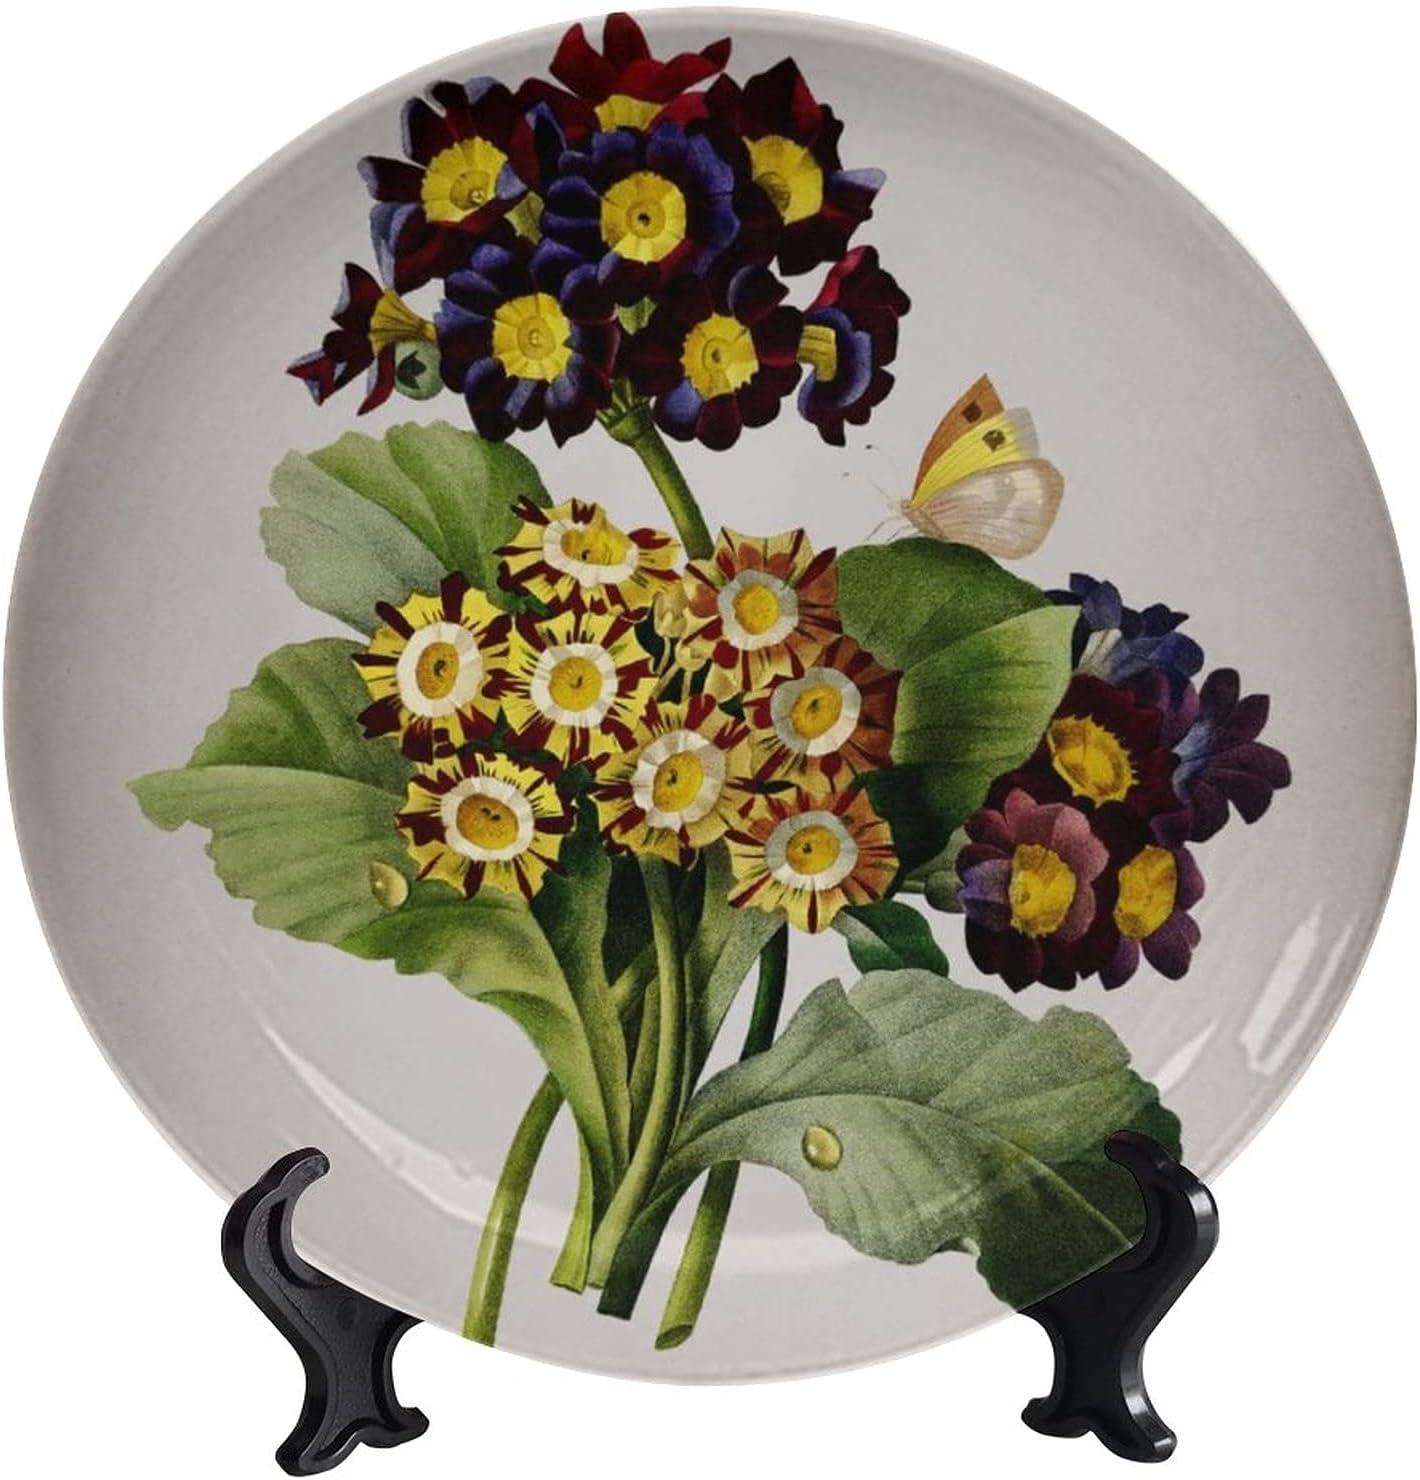 wonderr Ranking TOP12 Vintage Antique Flower Decoration Decorative Max 61% OFF Art Plates